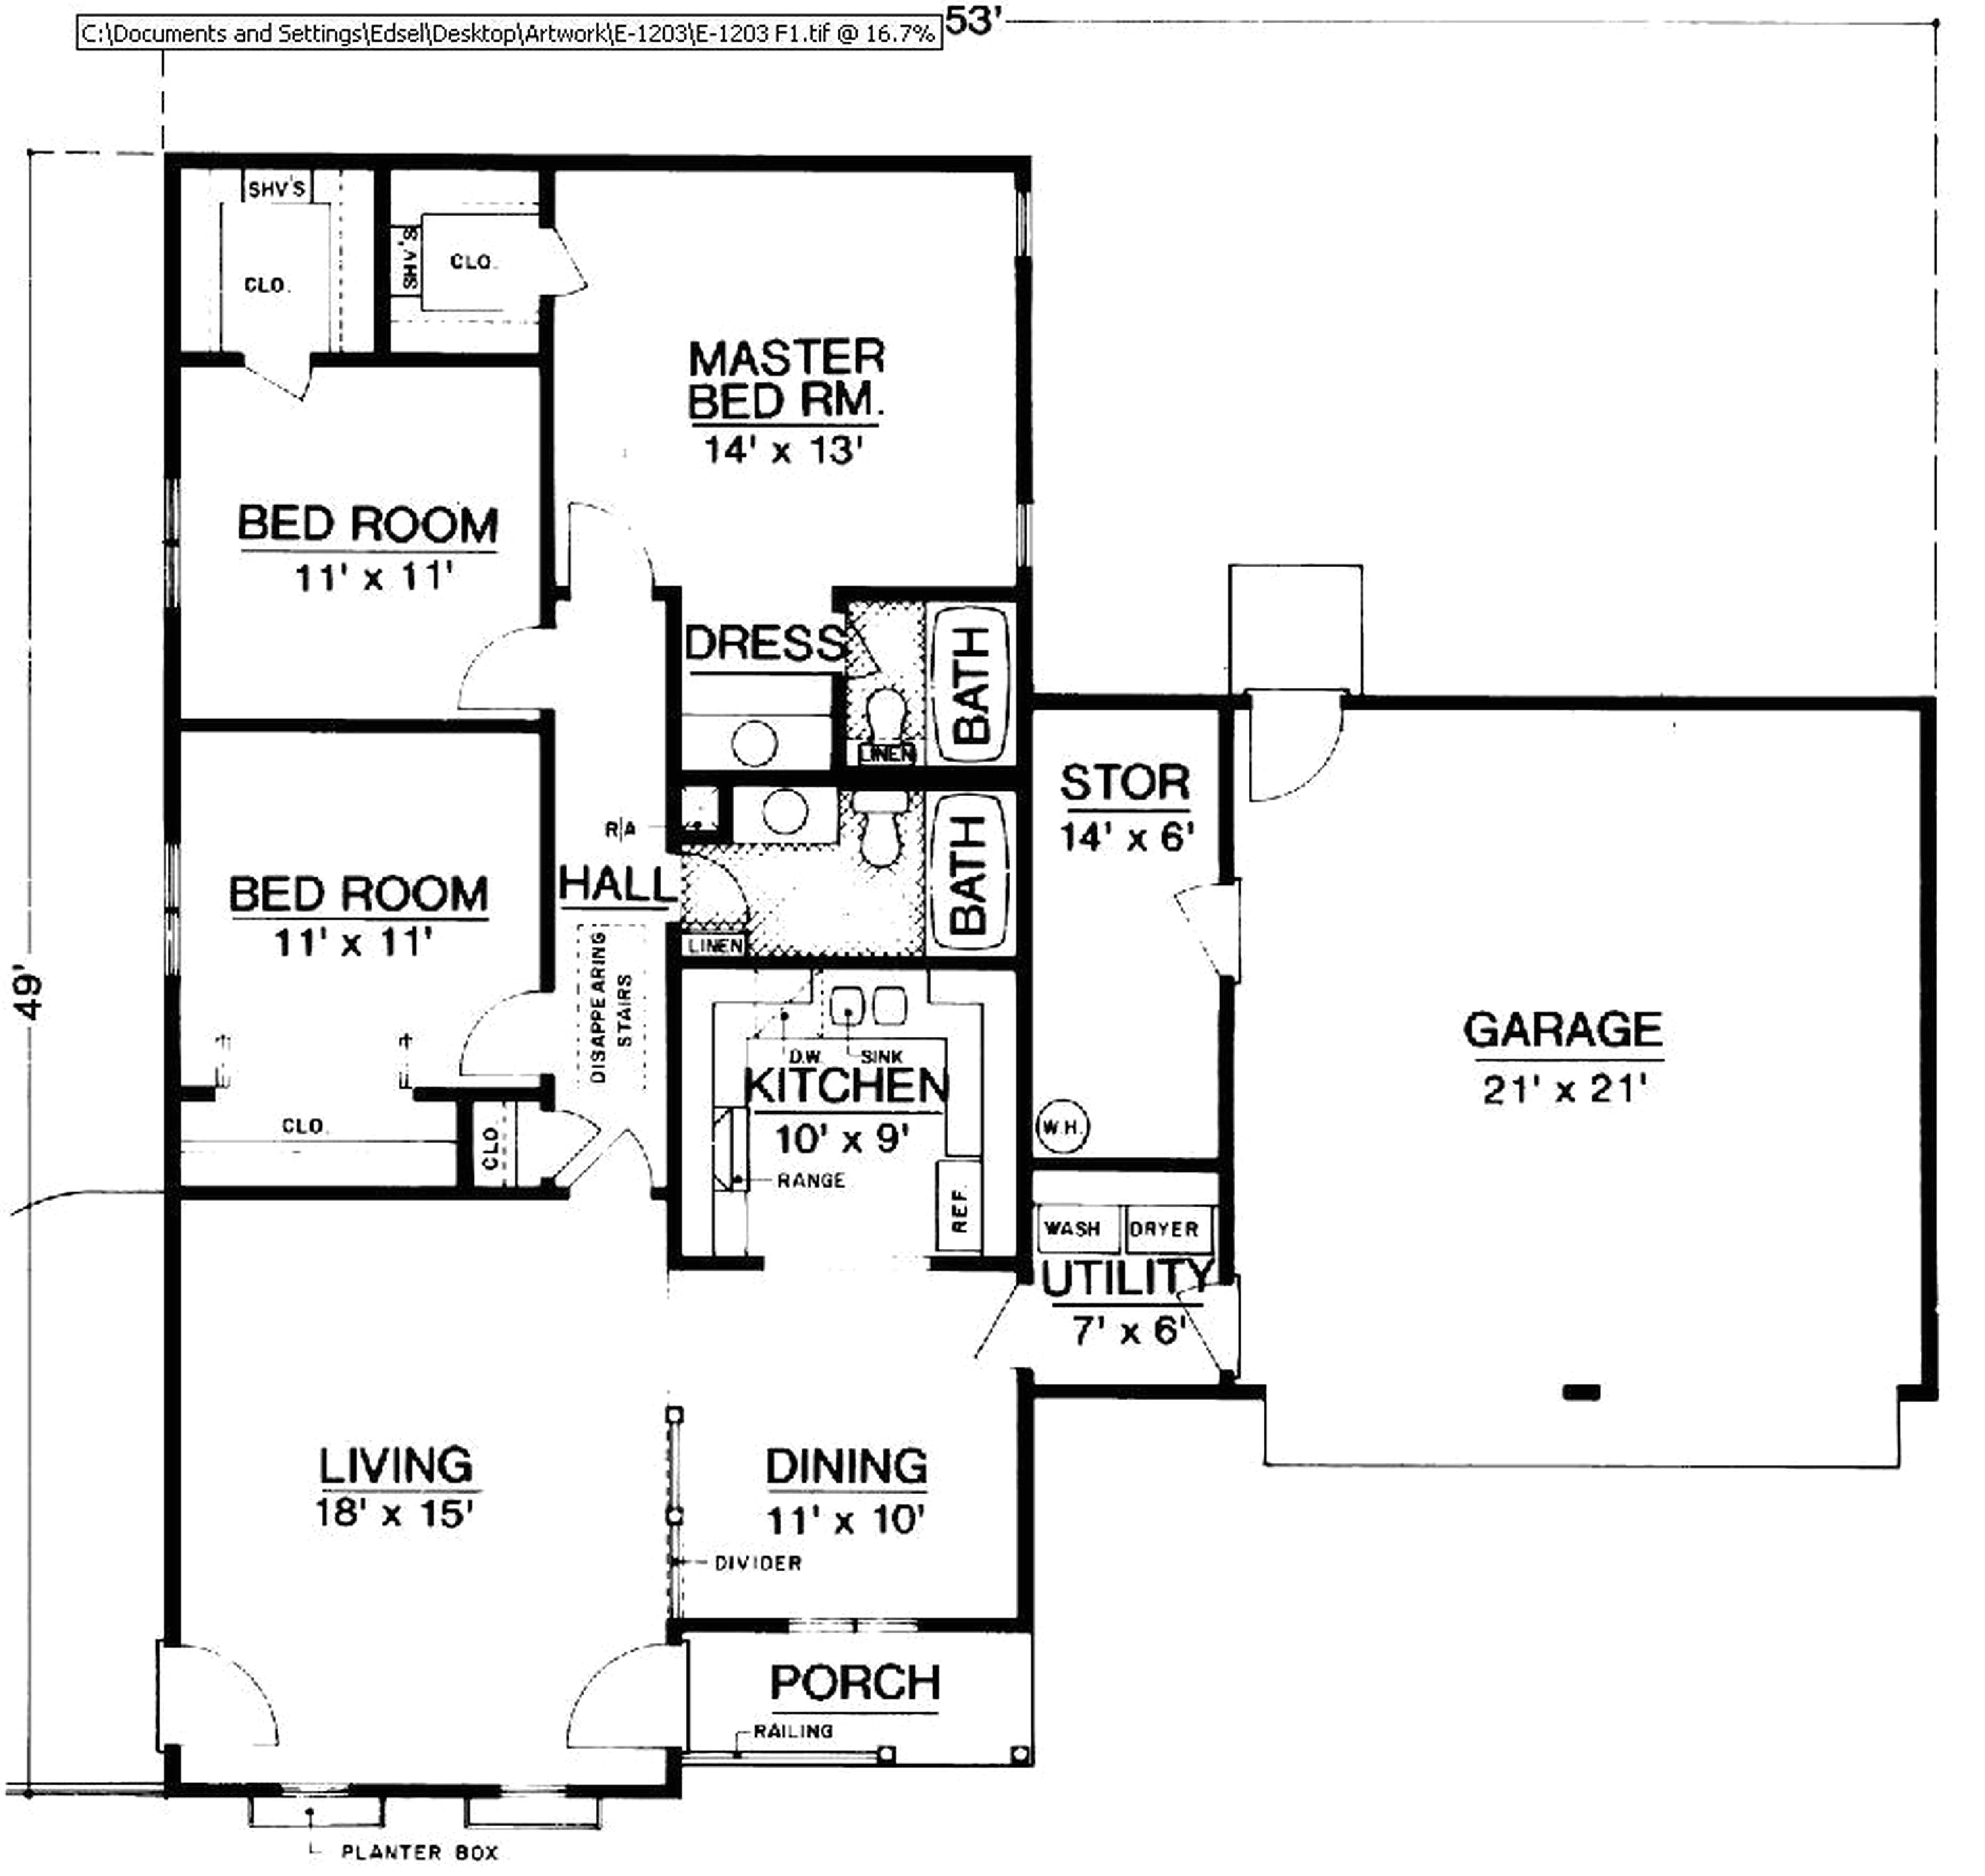 Old Kb Homes Floor Plans Wonderful 1 Level House Plans Images Exterior Ideas 3d